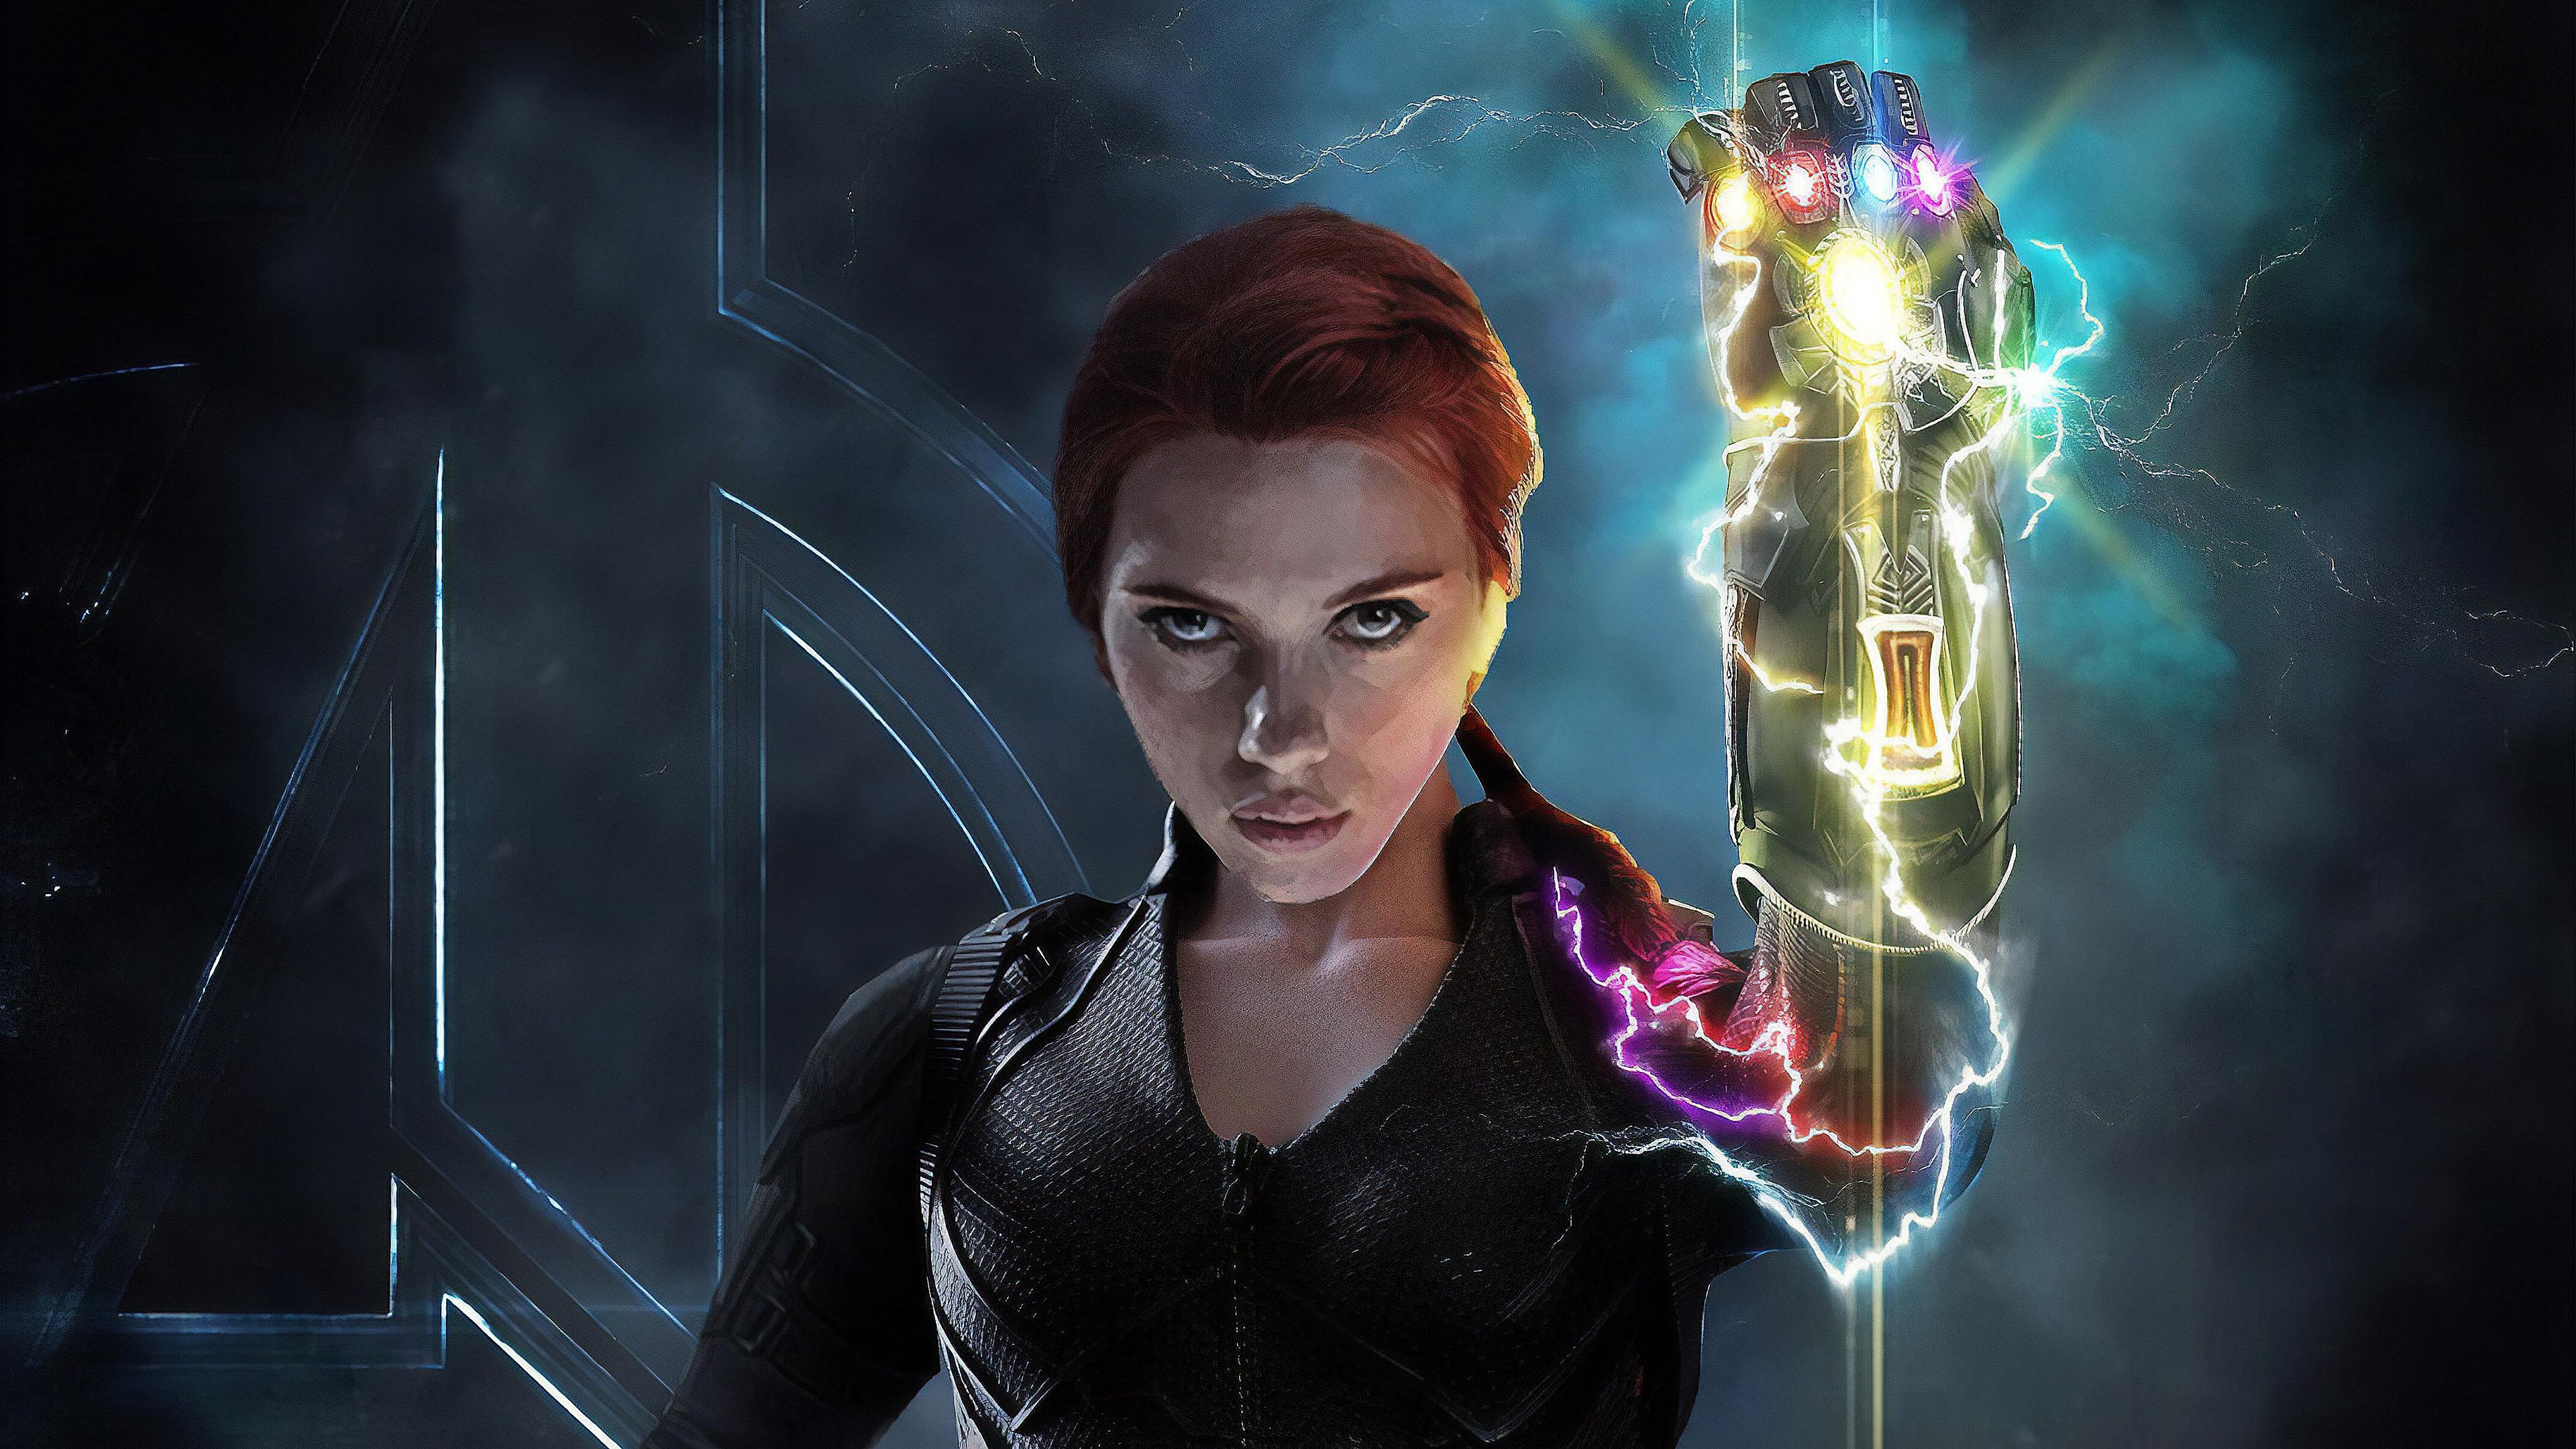 Black Widow With Infinity Gauntlet, HD Superheroes, 4k